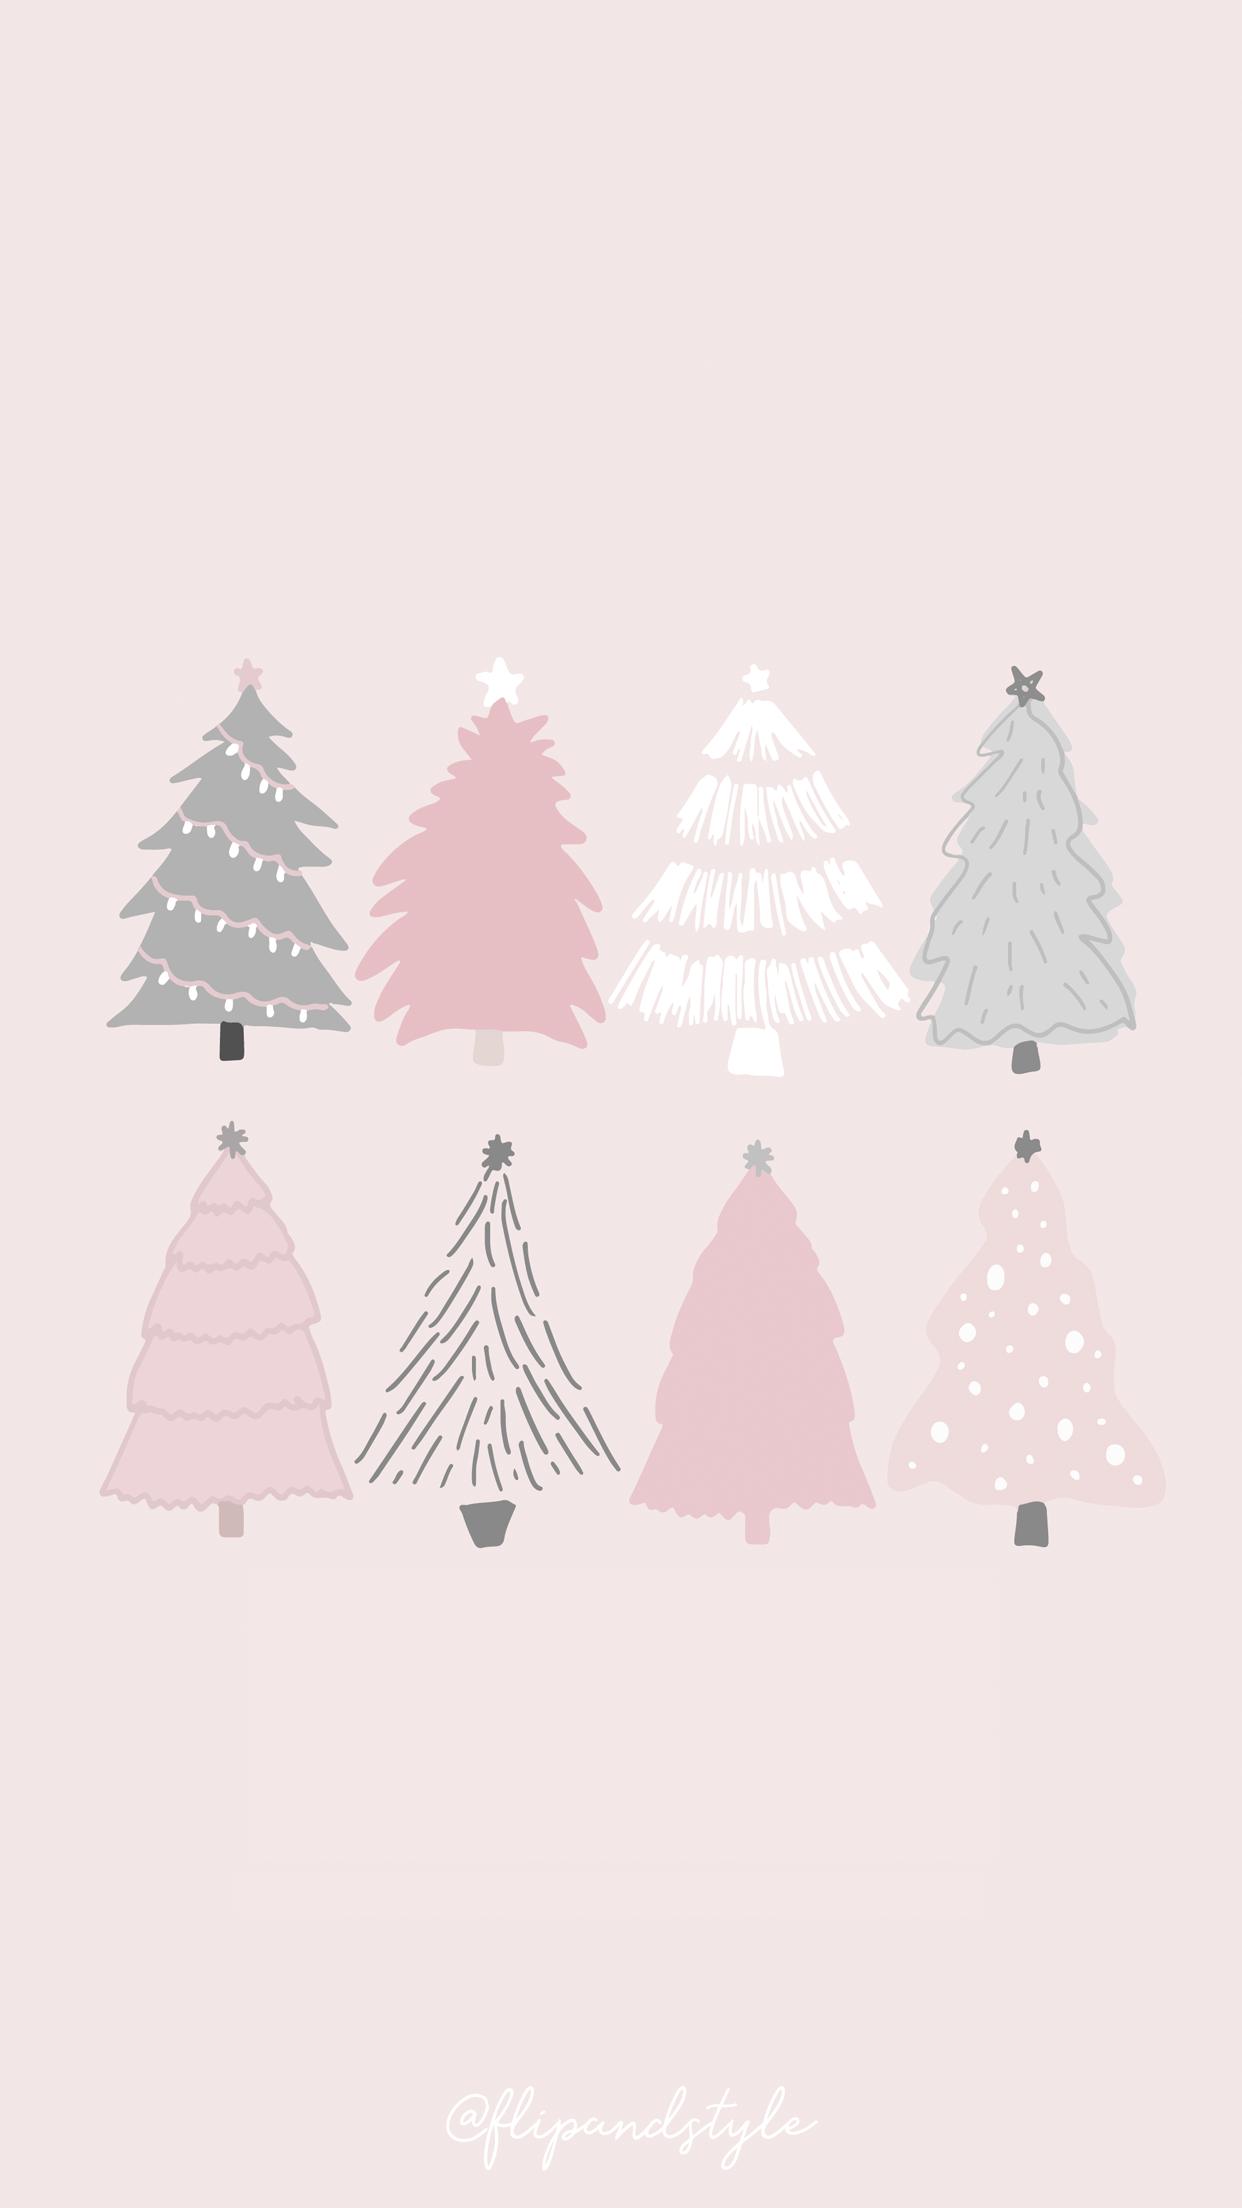 Pastel Christmas Wallpapers On Wallpaperdog